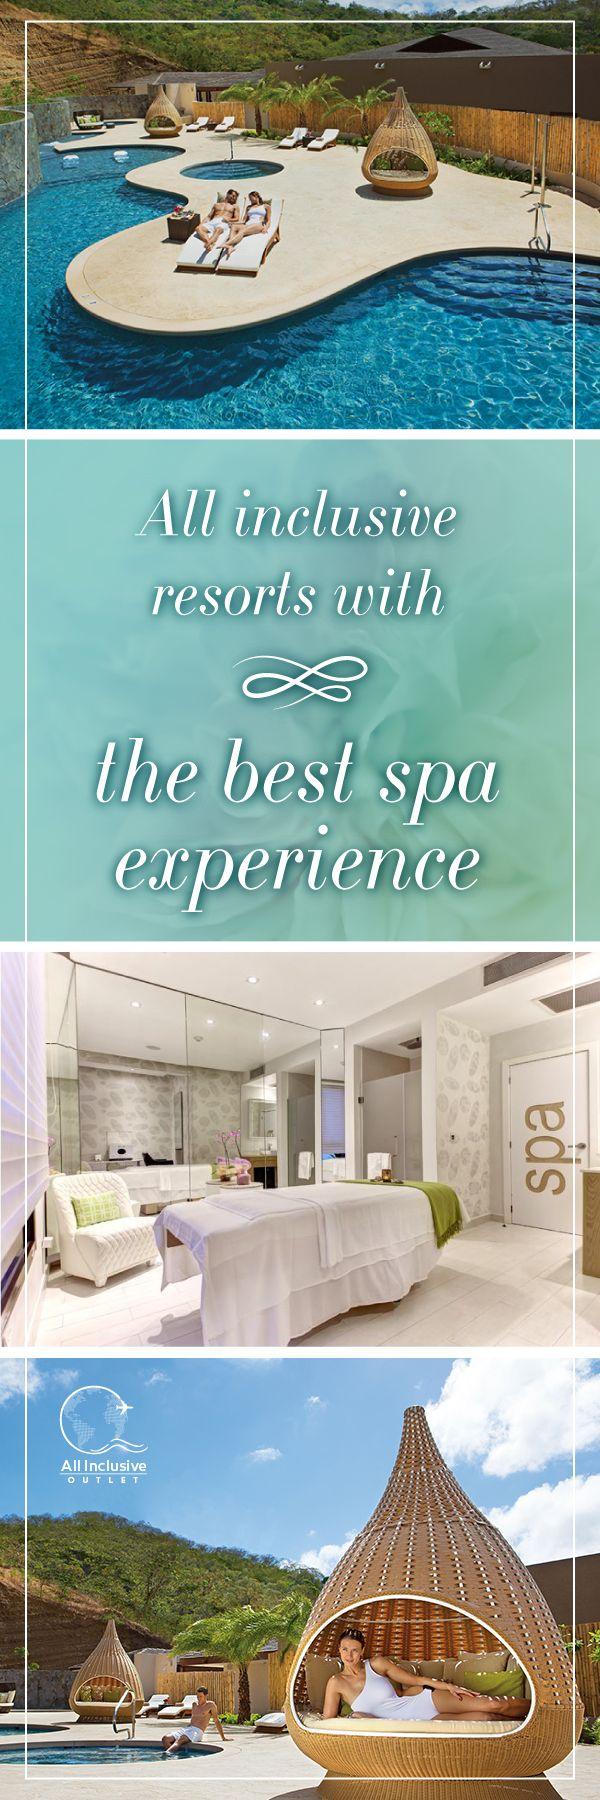 Best All Inclusive Spa Resorts All Inclusive Outlet Blog Resort Spa All Inclusive Resorts Resort